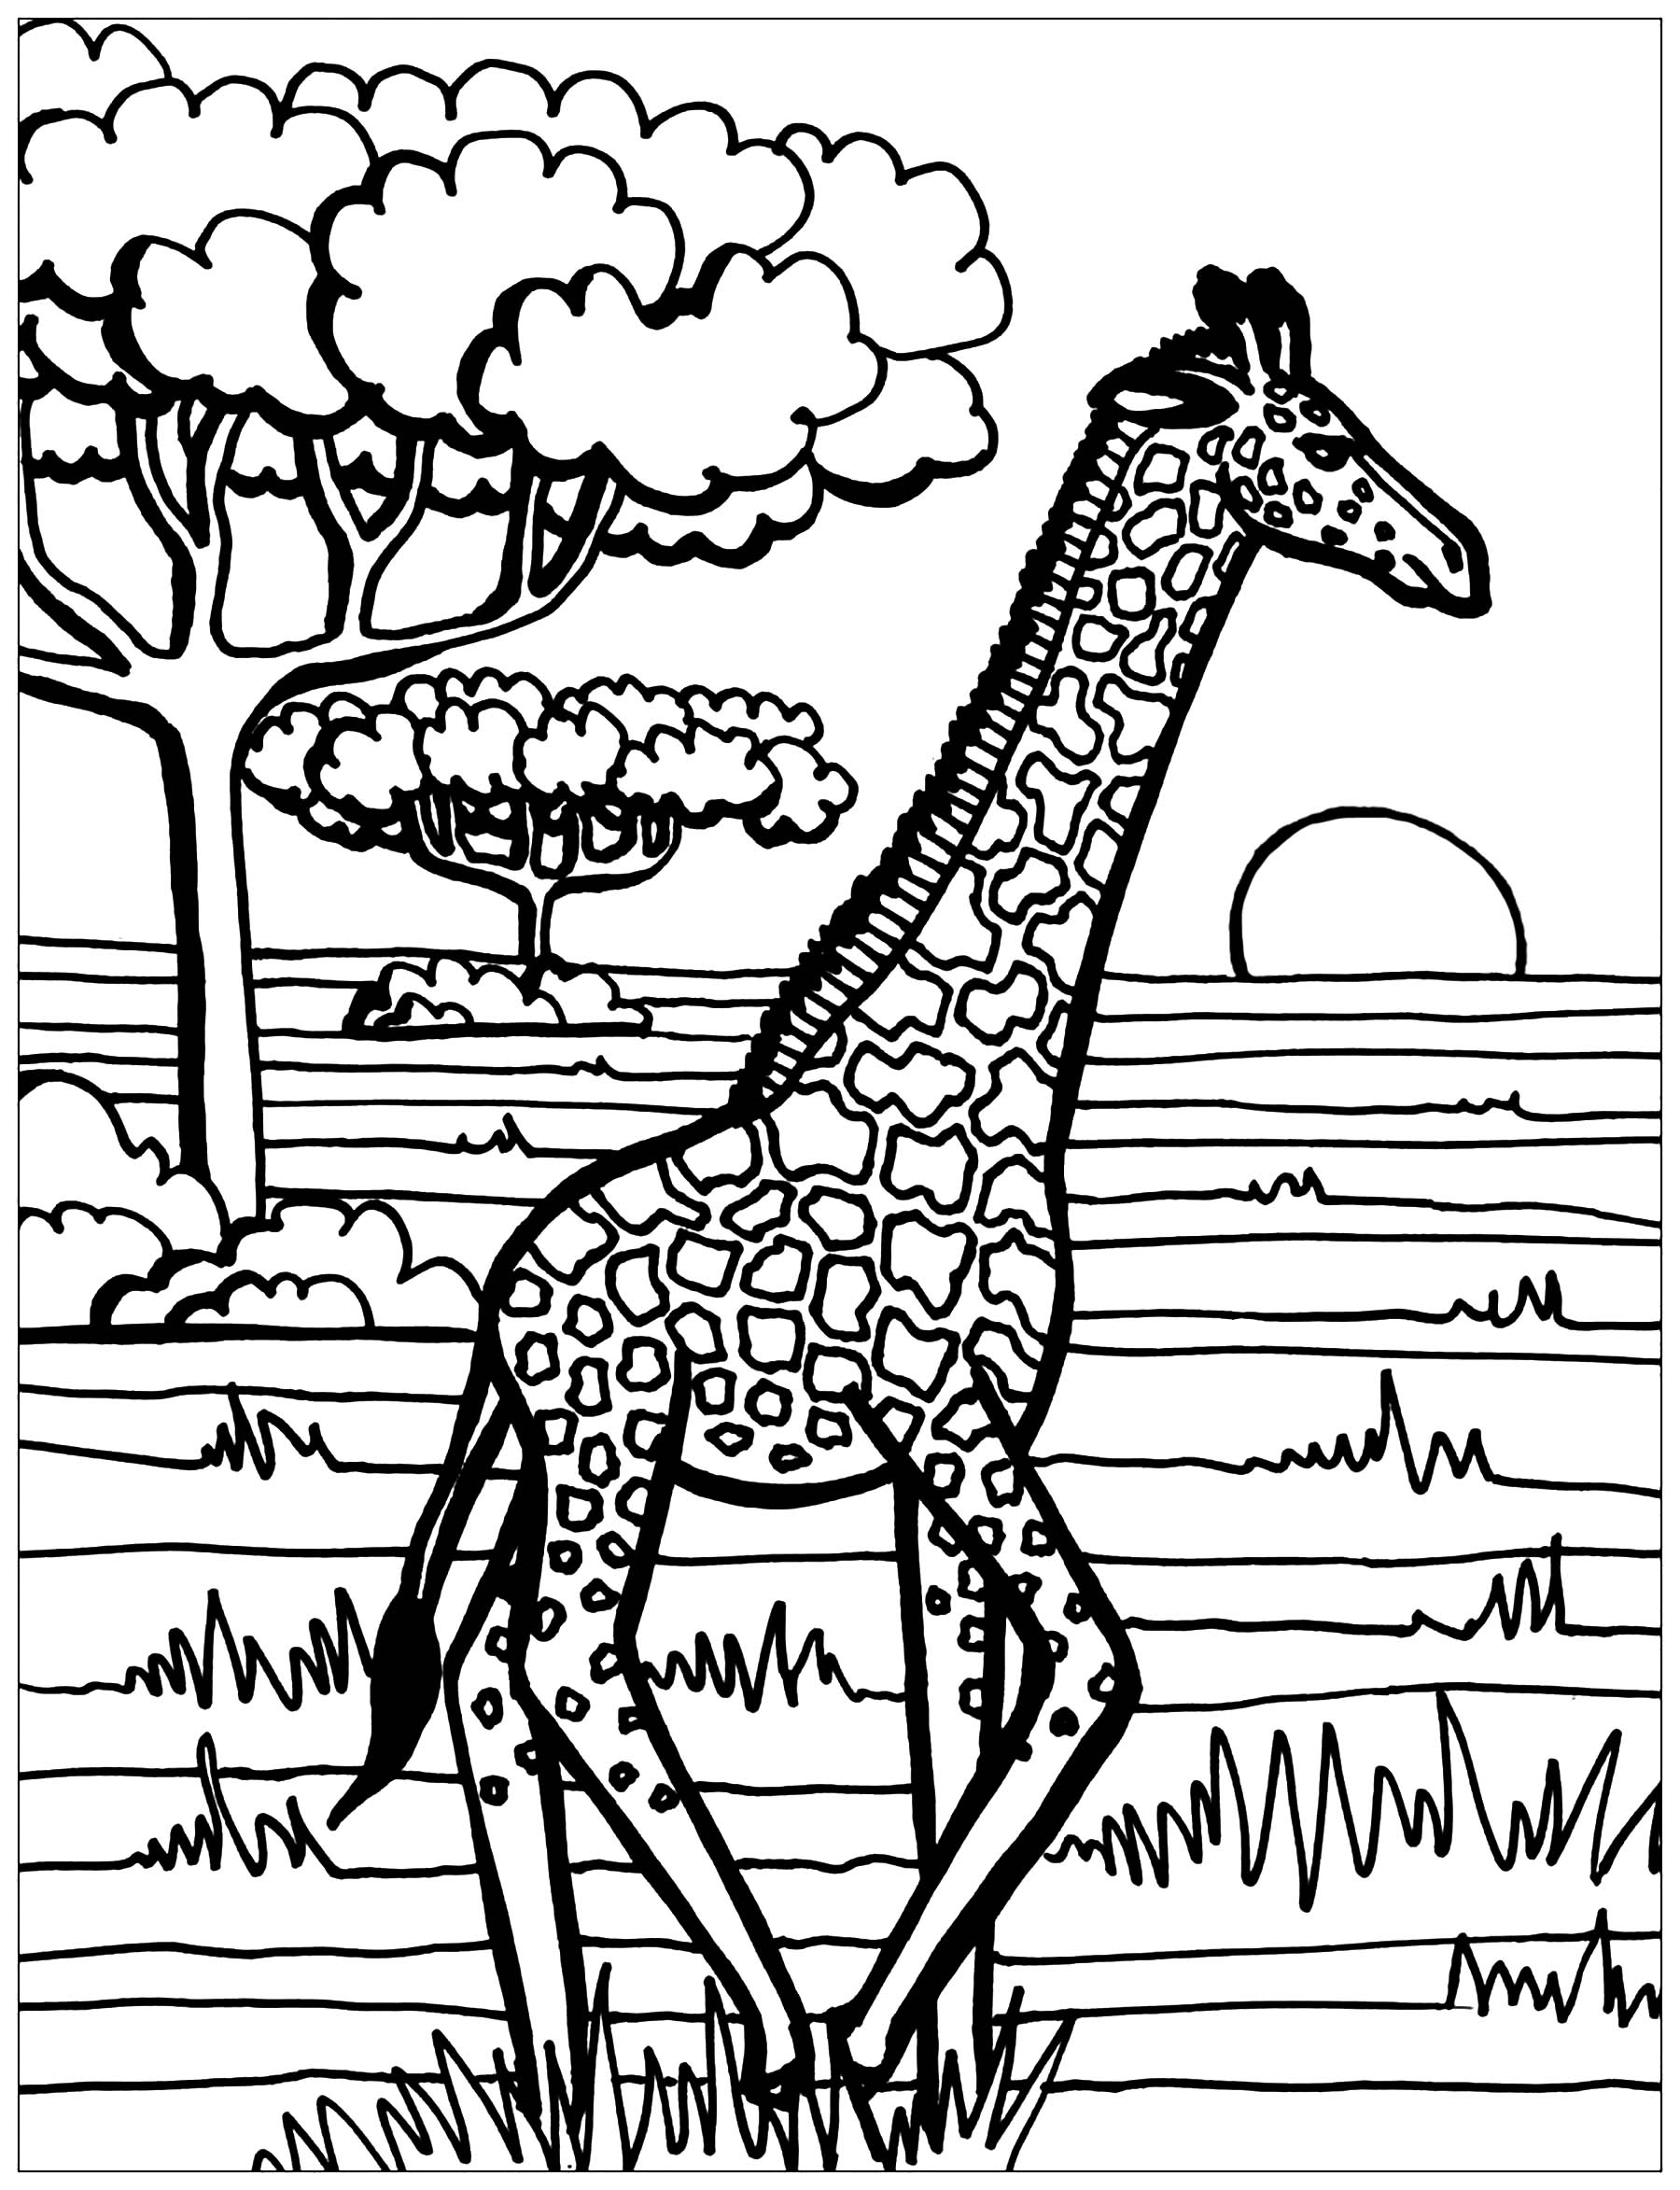 Colorear para Adultos : Jirafas - 4